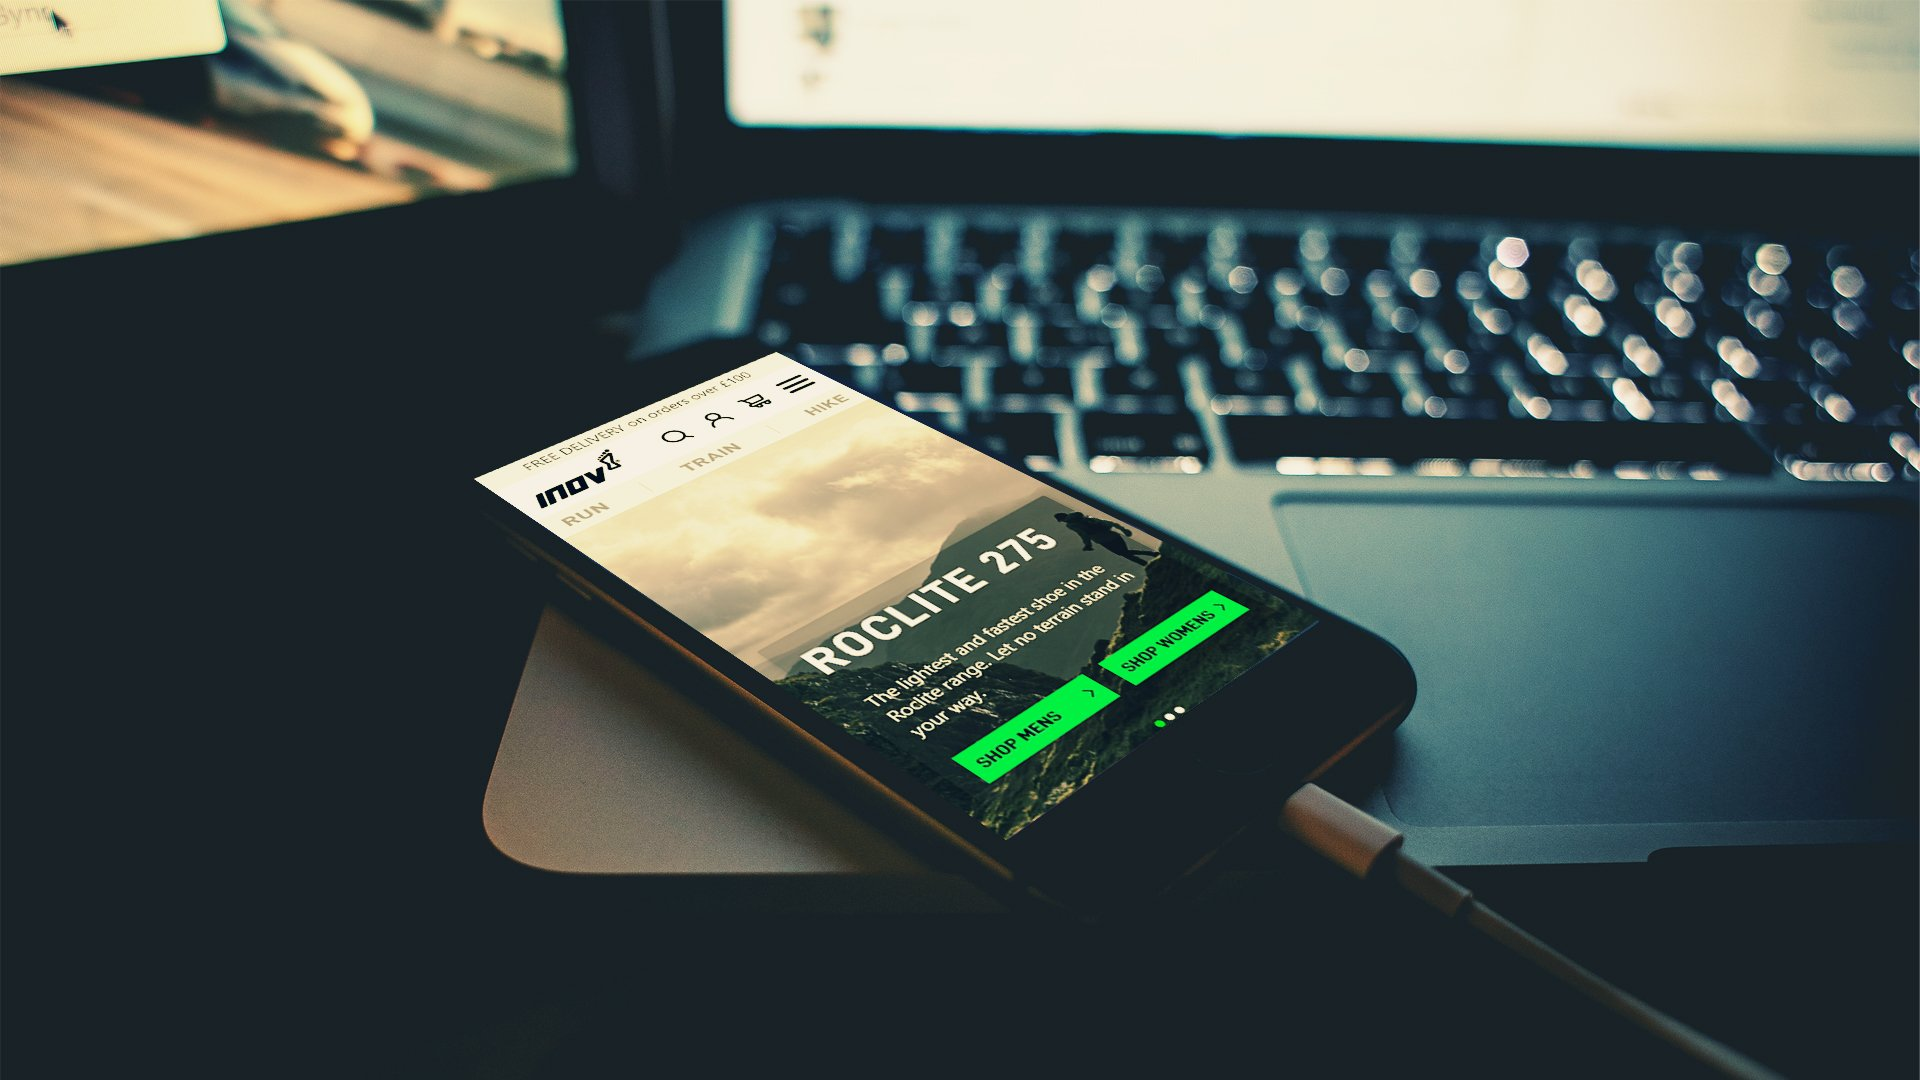 inov8 optimised mobile ux